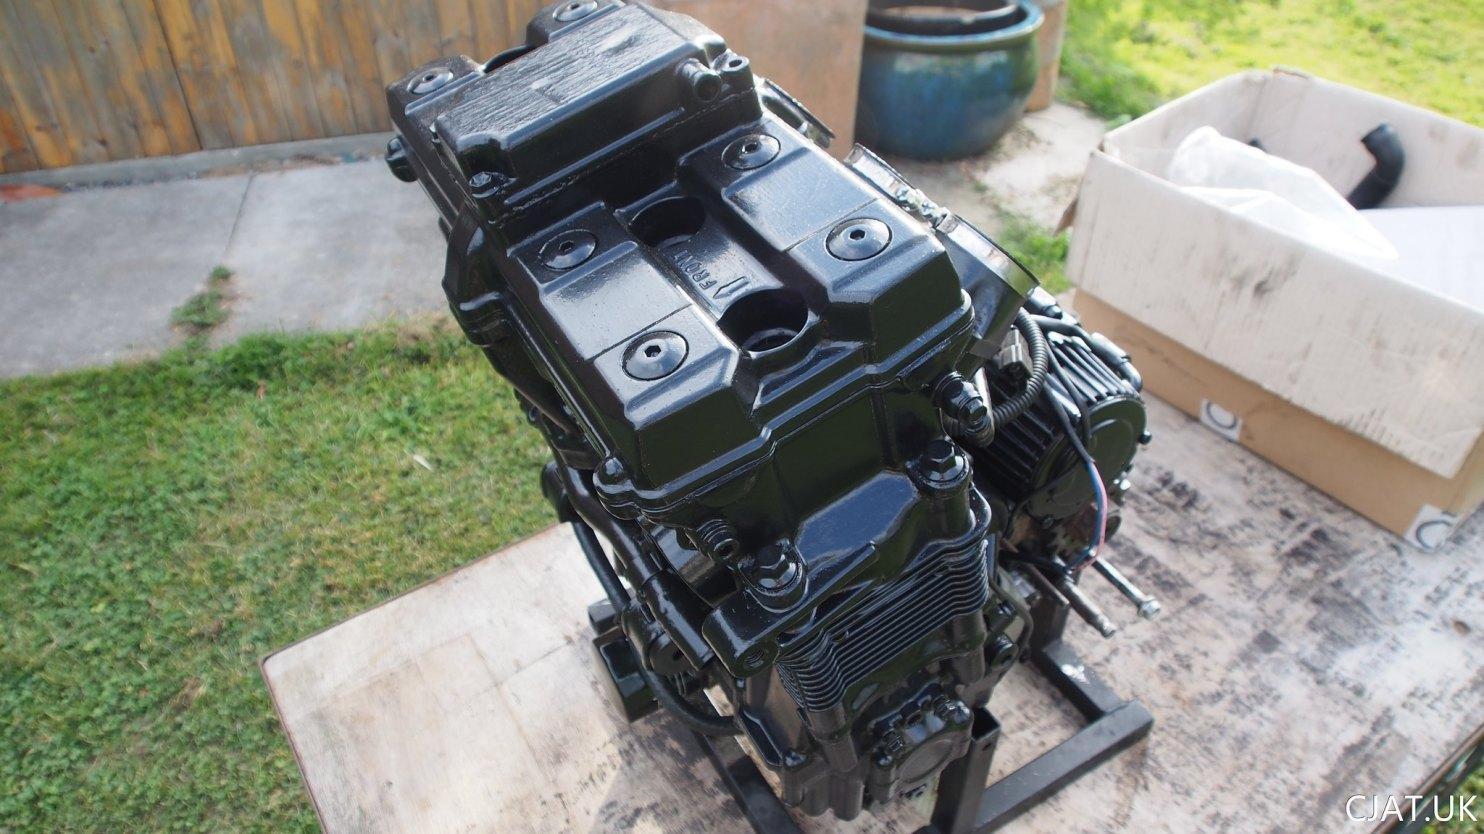 Suzuki RF900 StreetFighter painted engine